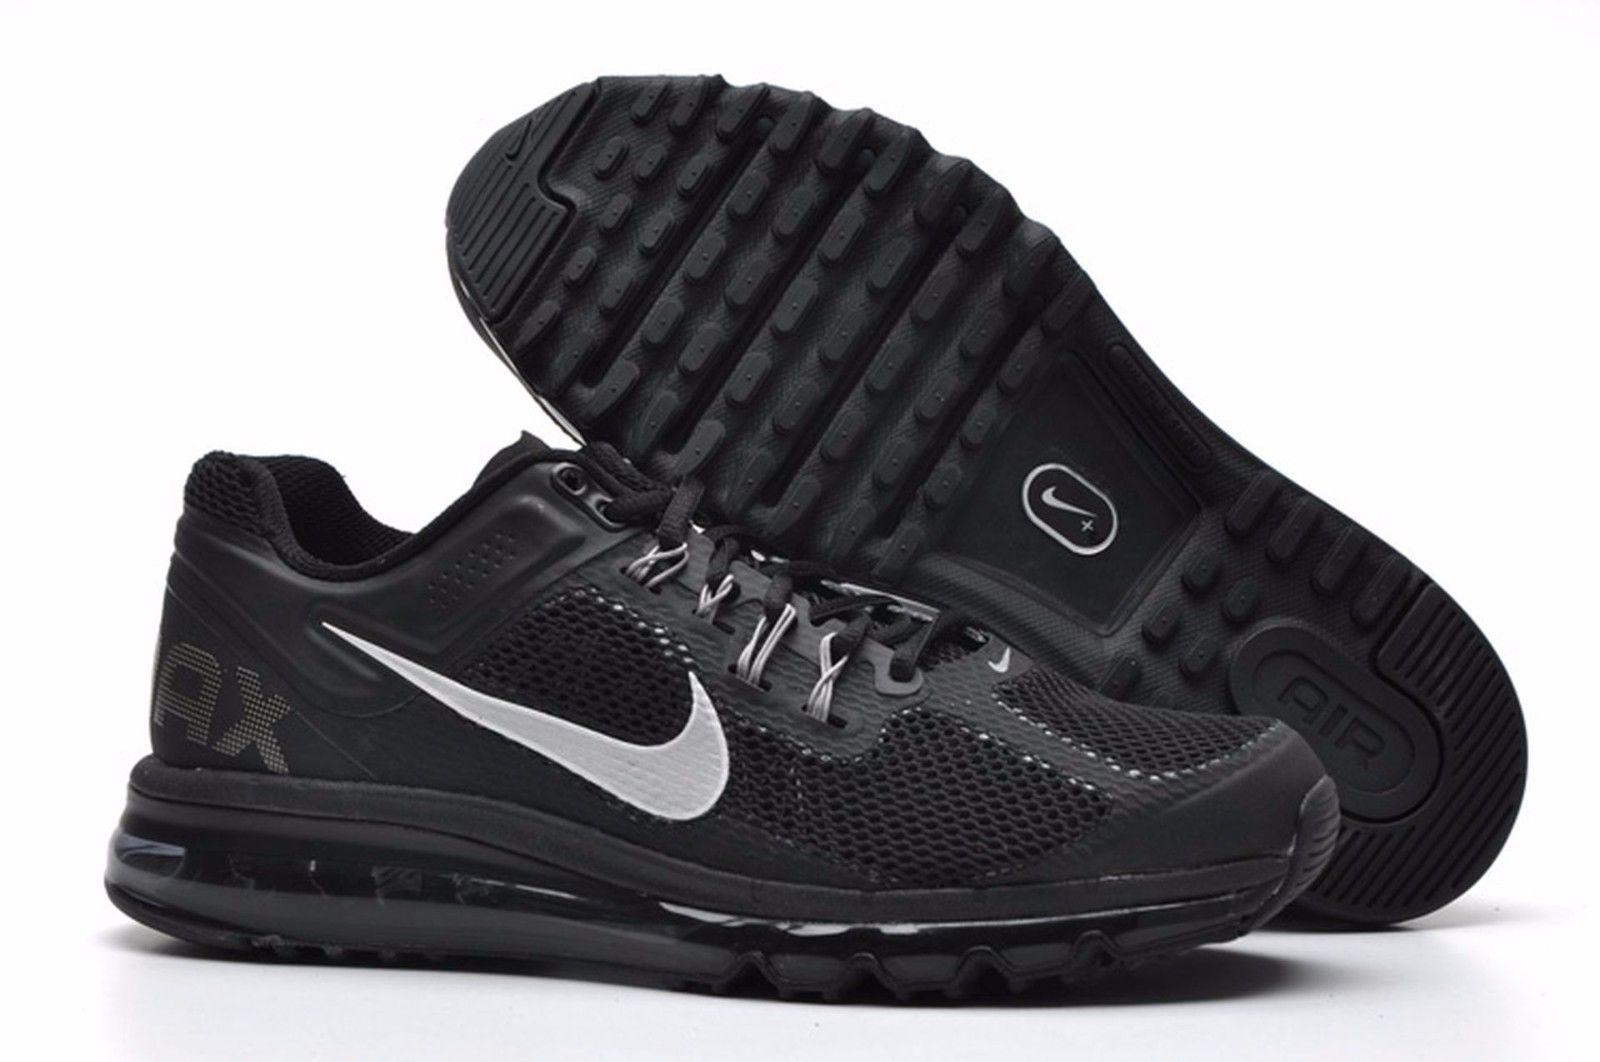 Nike Air Max 2013 Running Shoe size 8.5 554886-001 Mens Black/Dark Grey